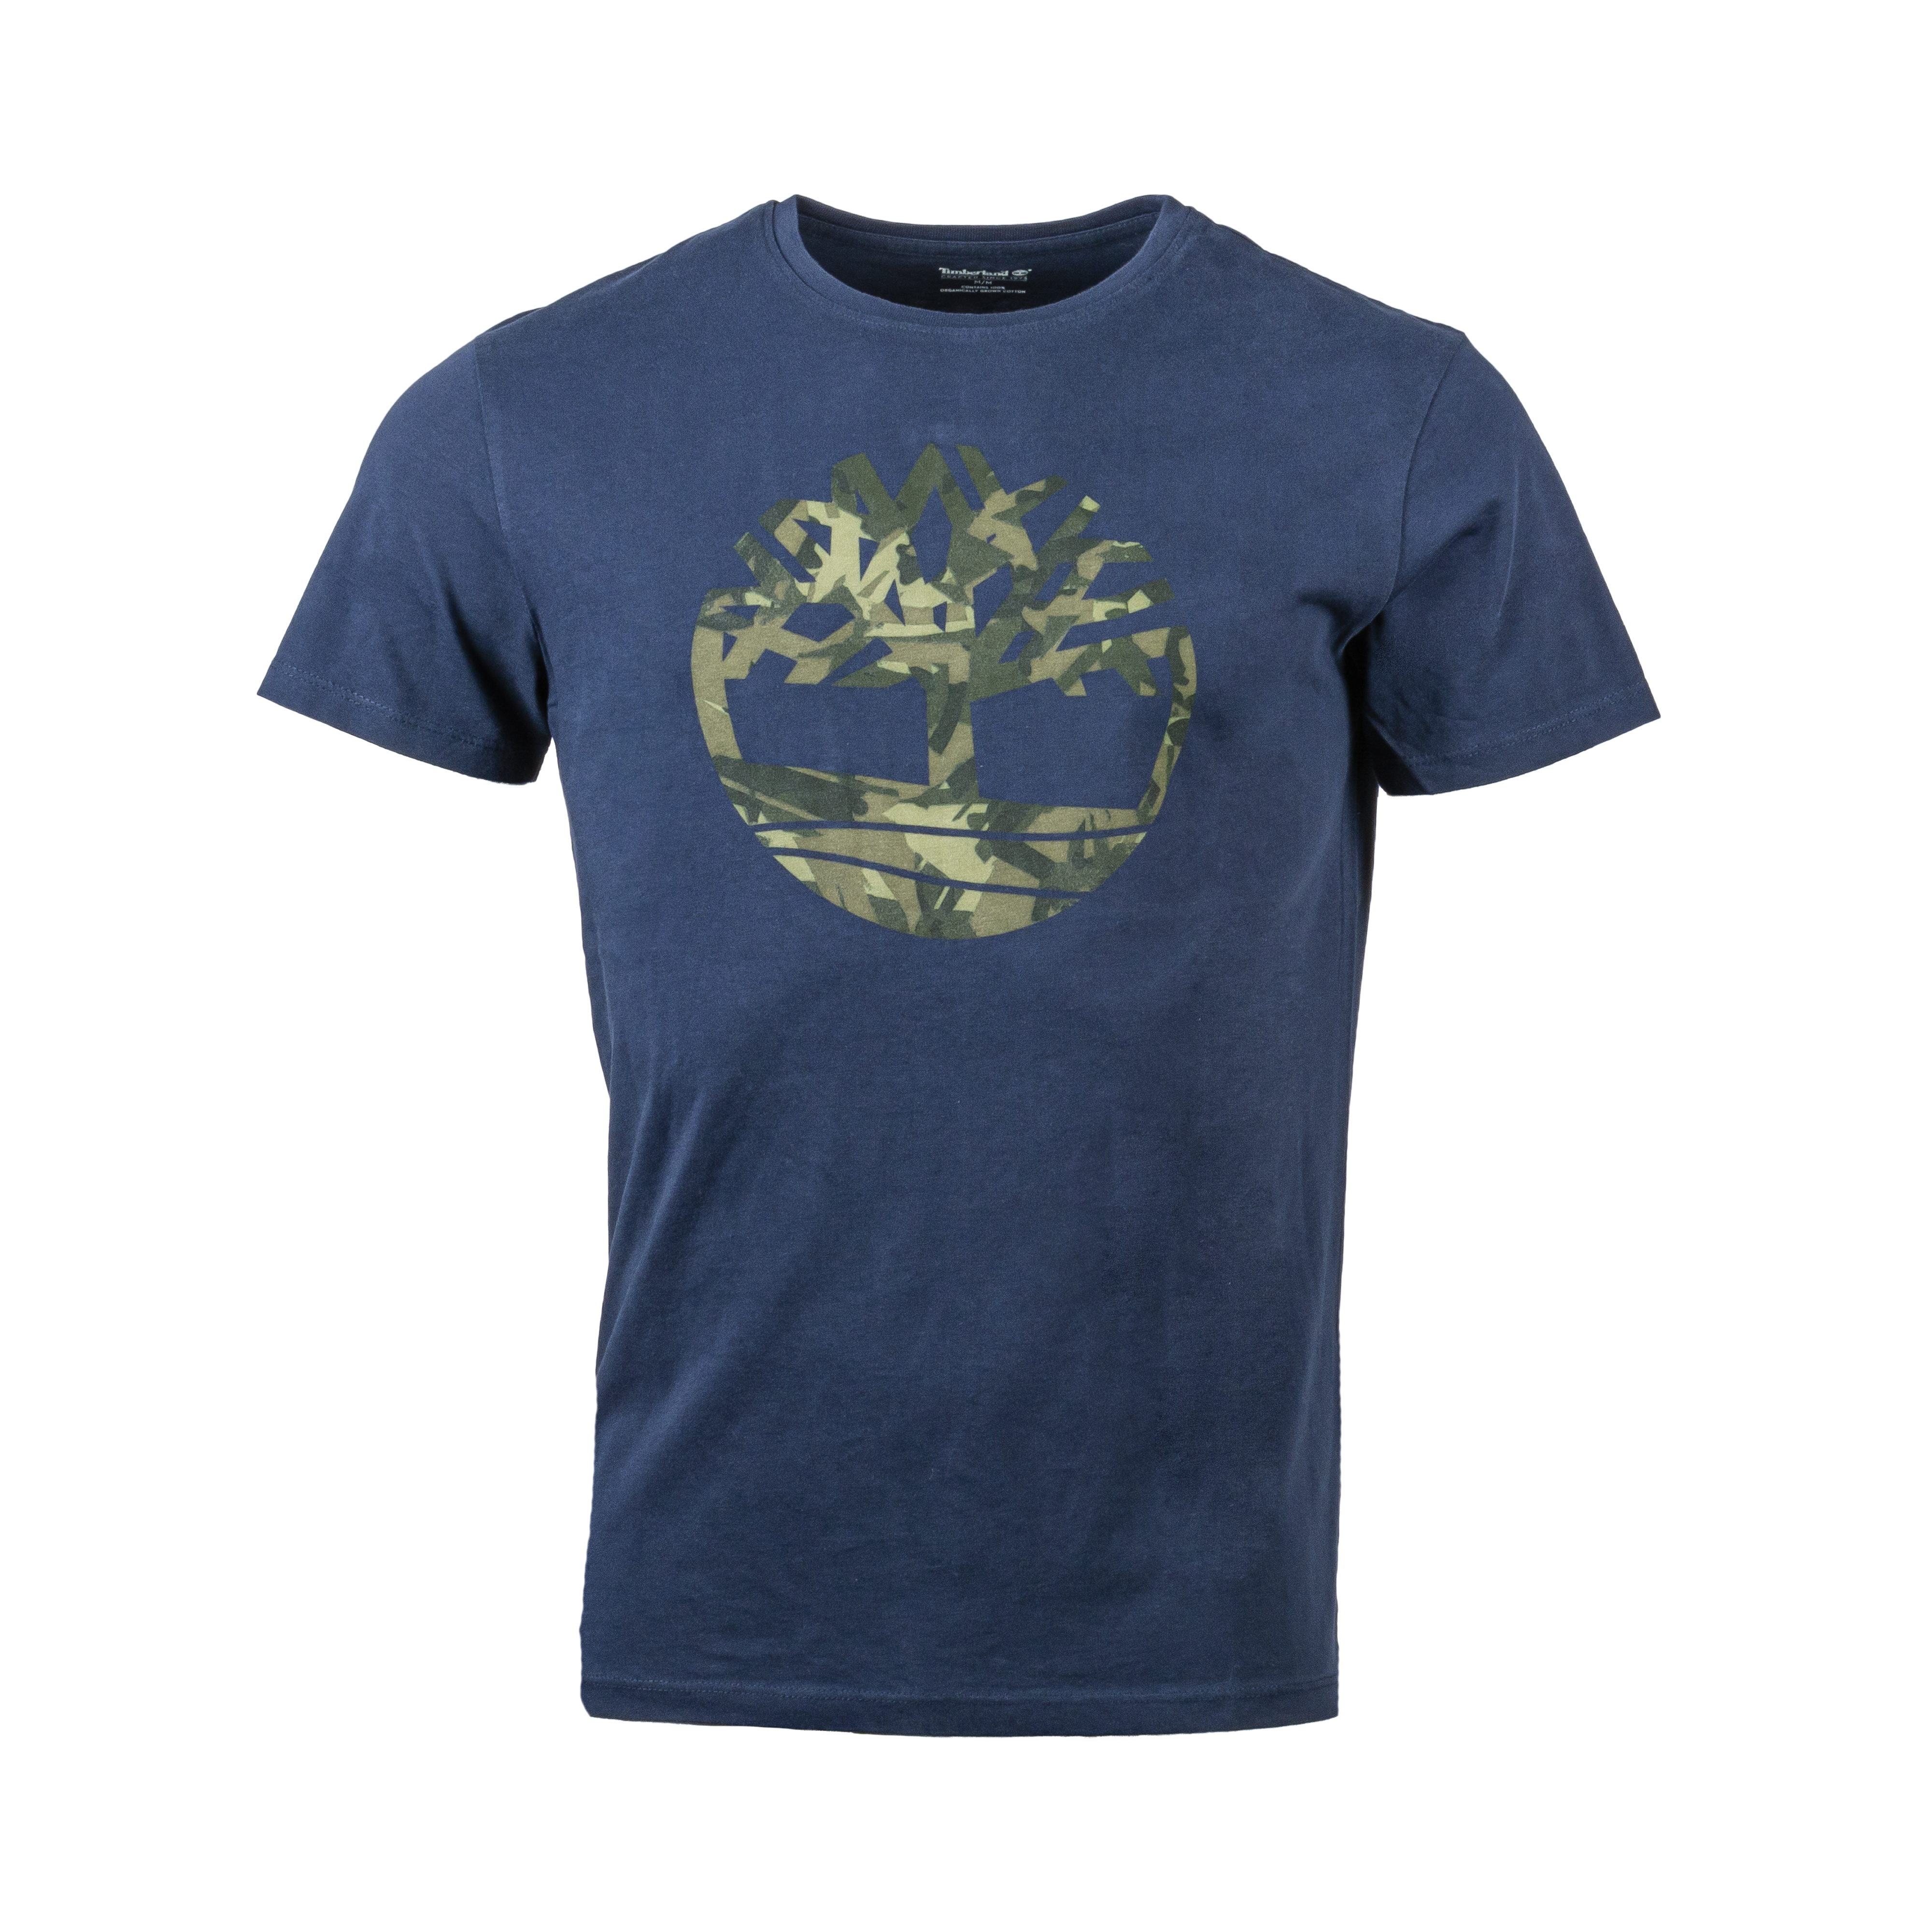 Tee-shirt  en coton bleu marine floqué